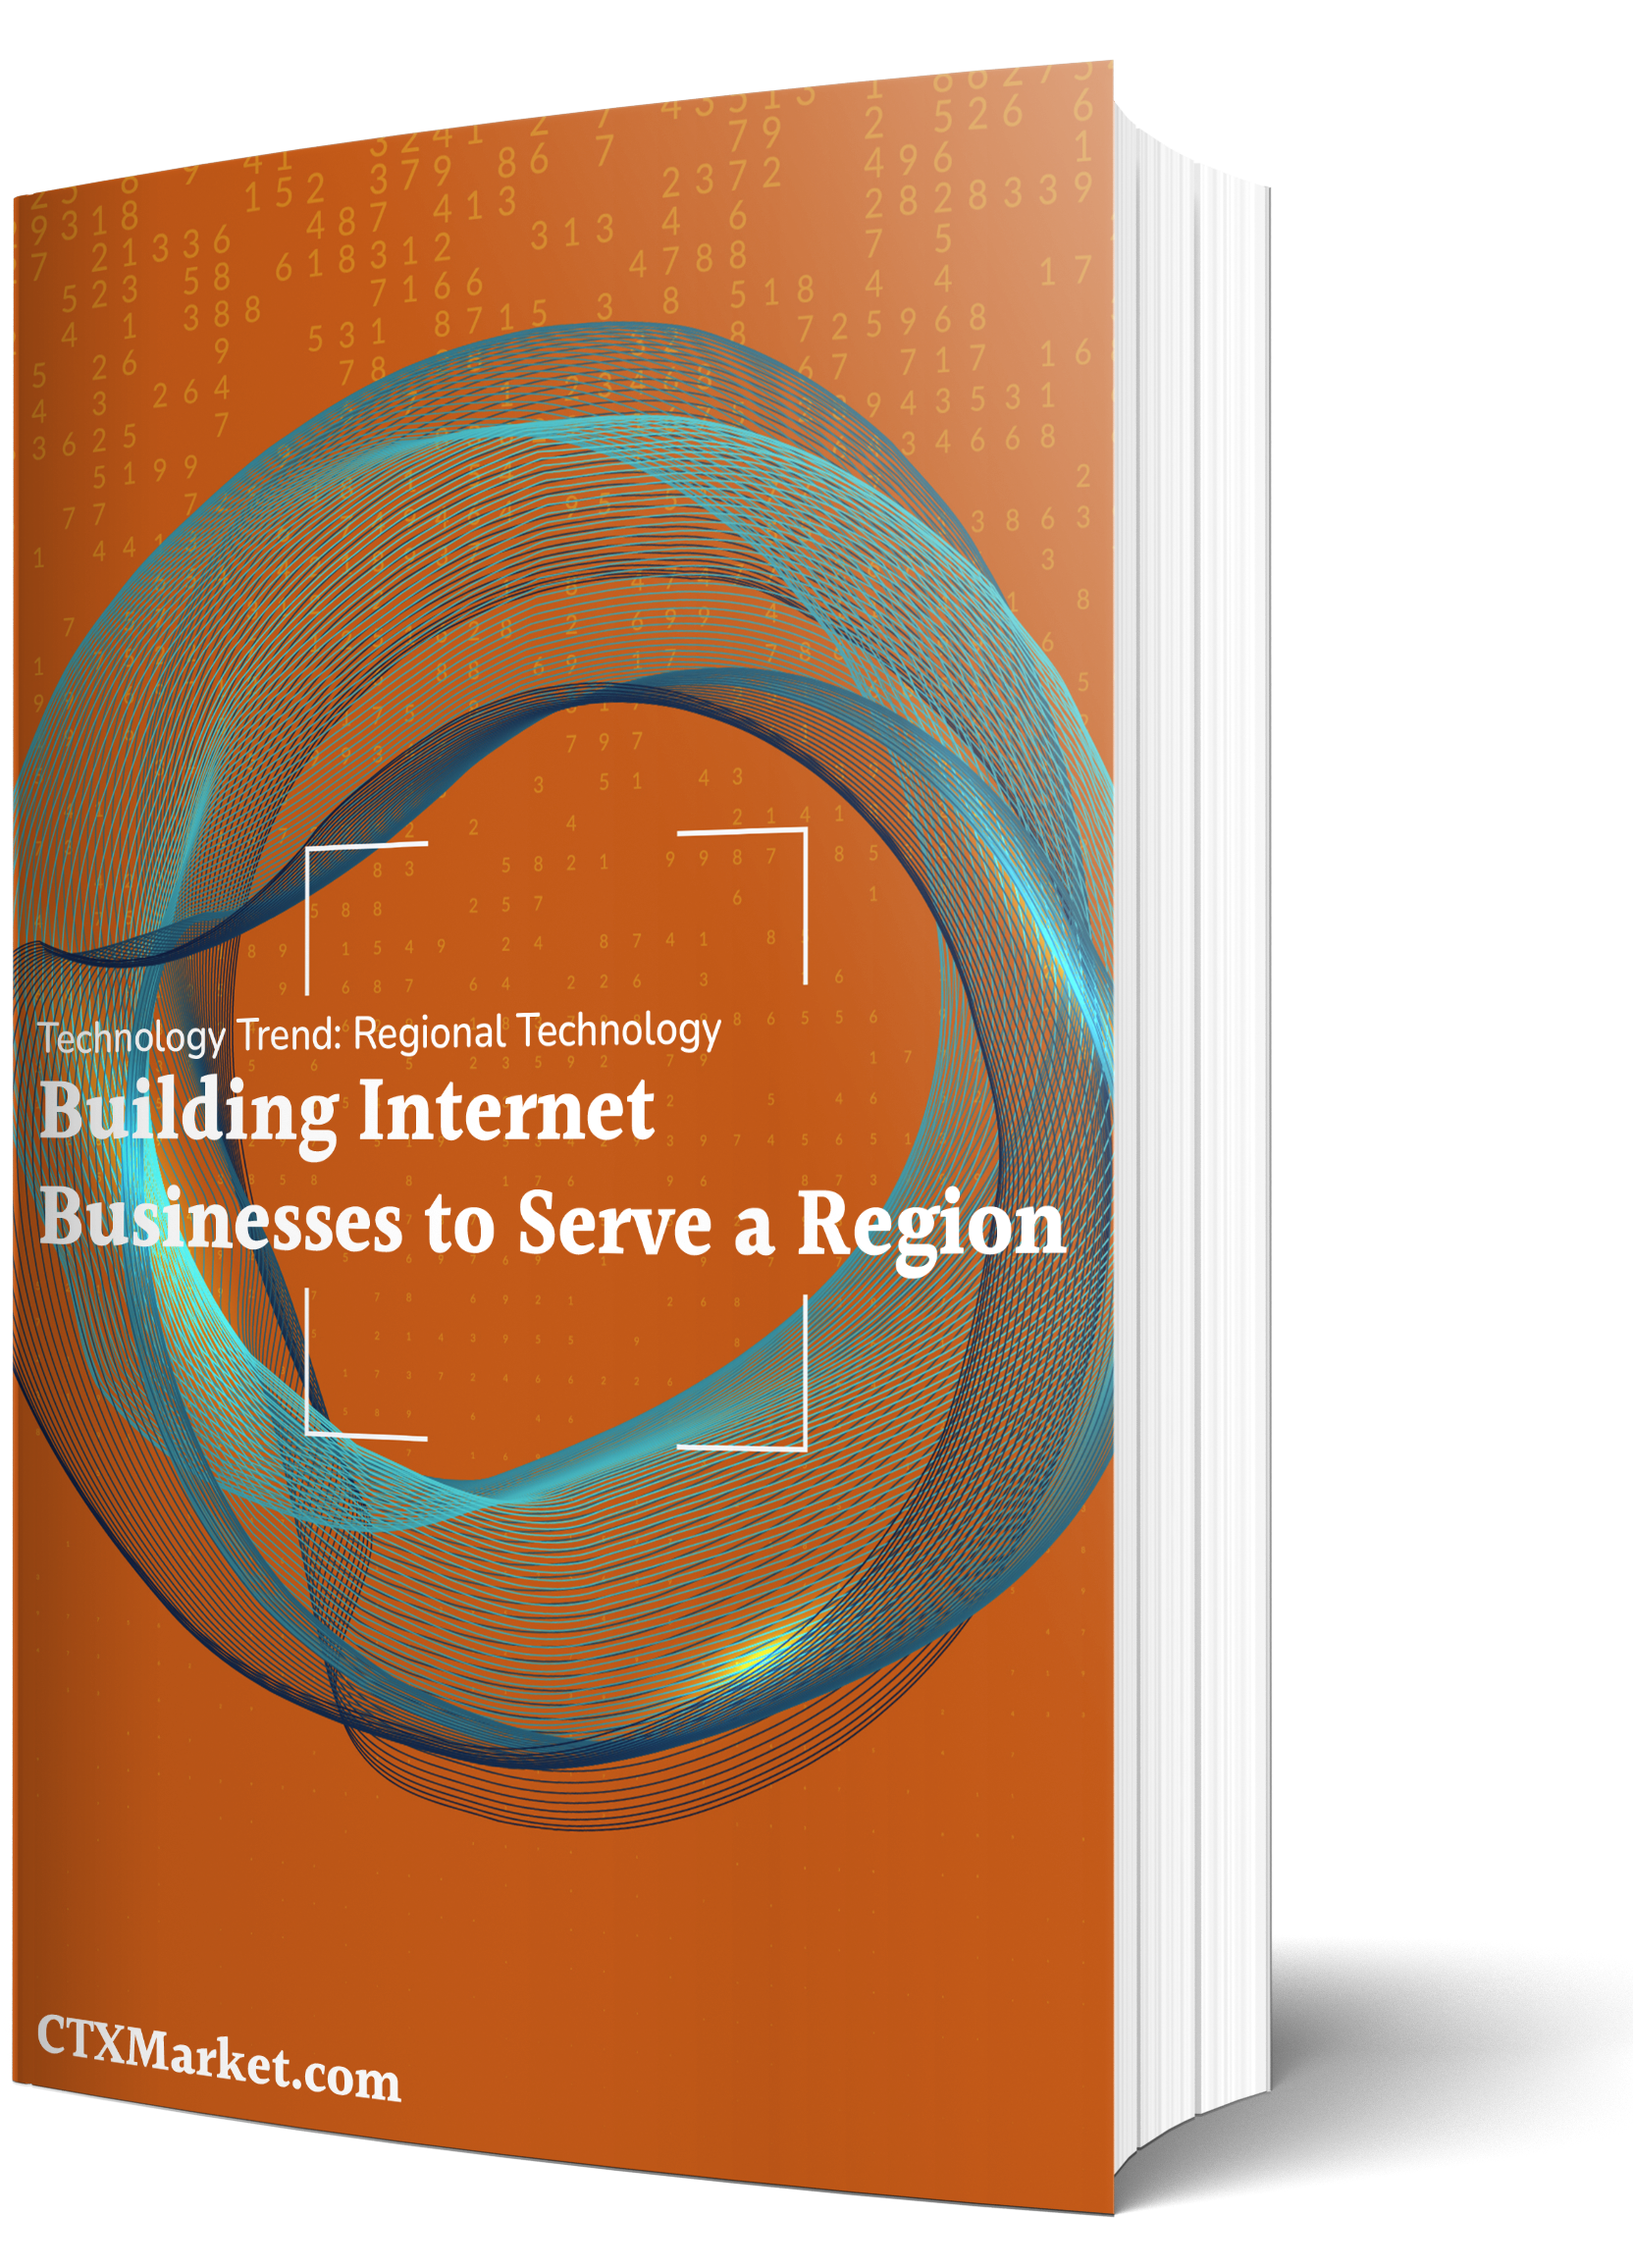 Regional Technology White Paper from CTXMarket.com